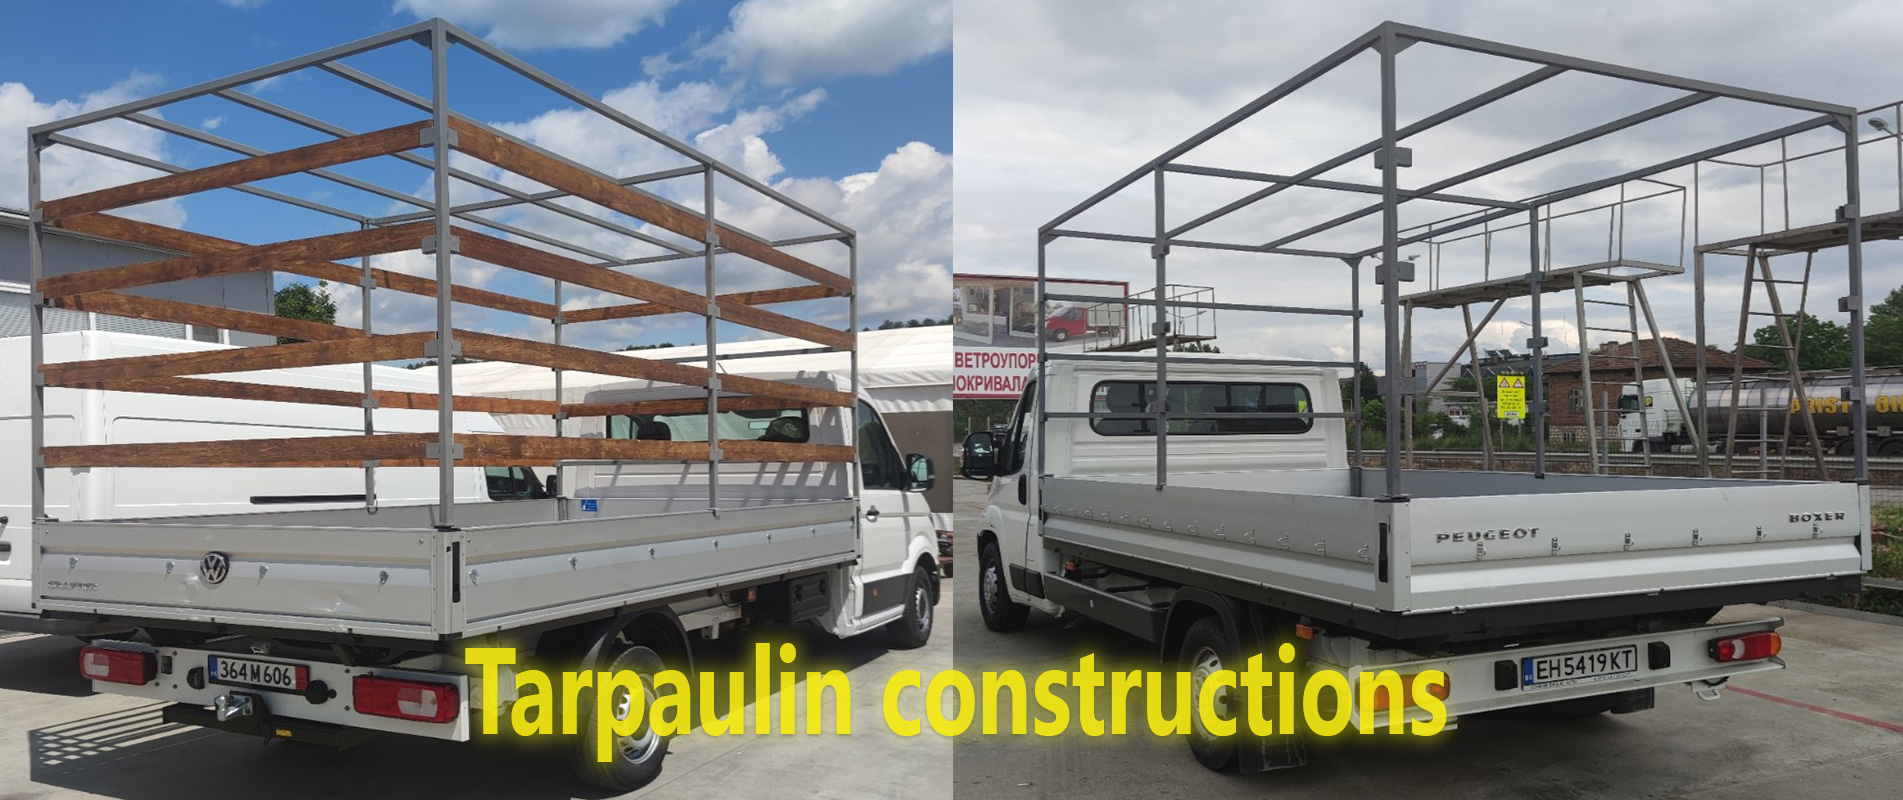 Constructions for tarpaulin